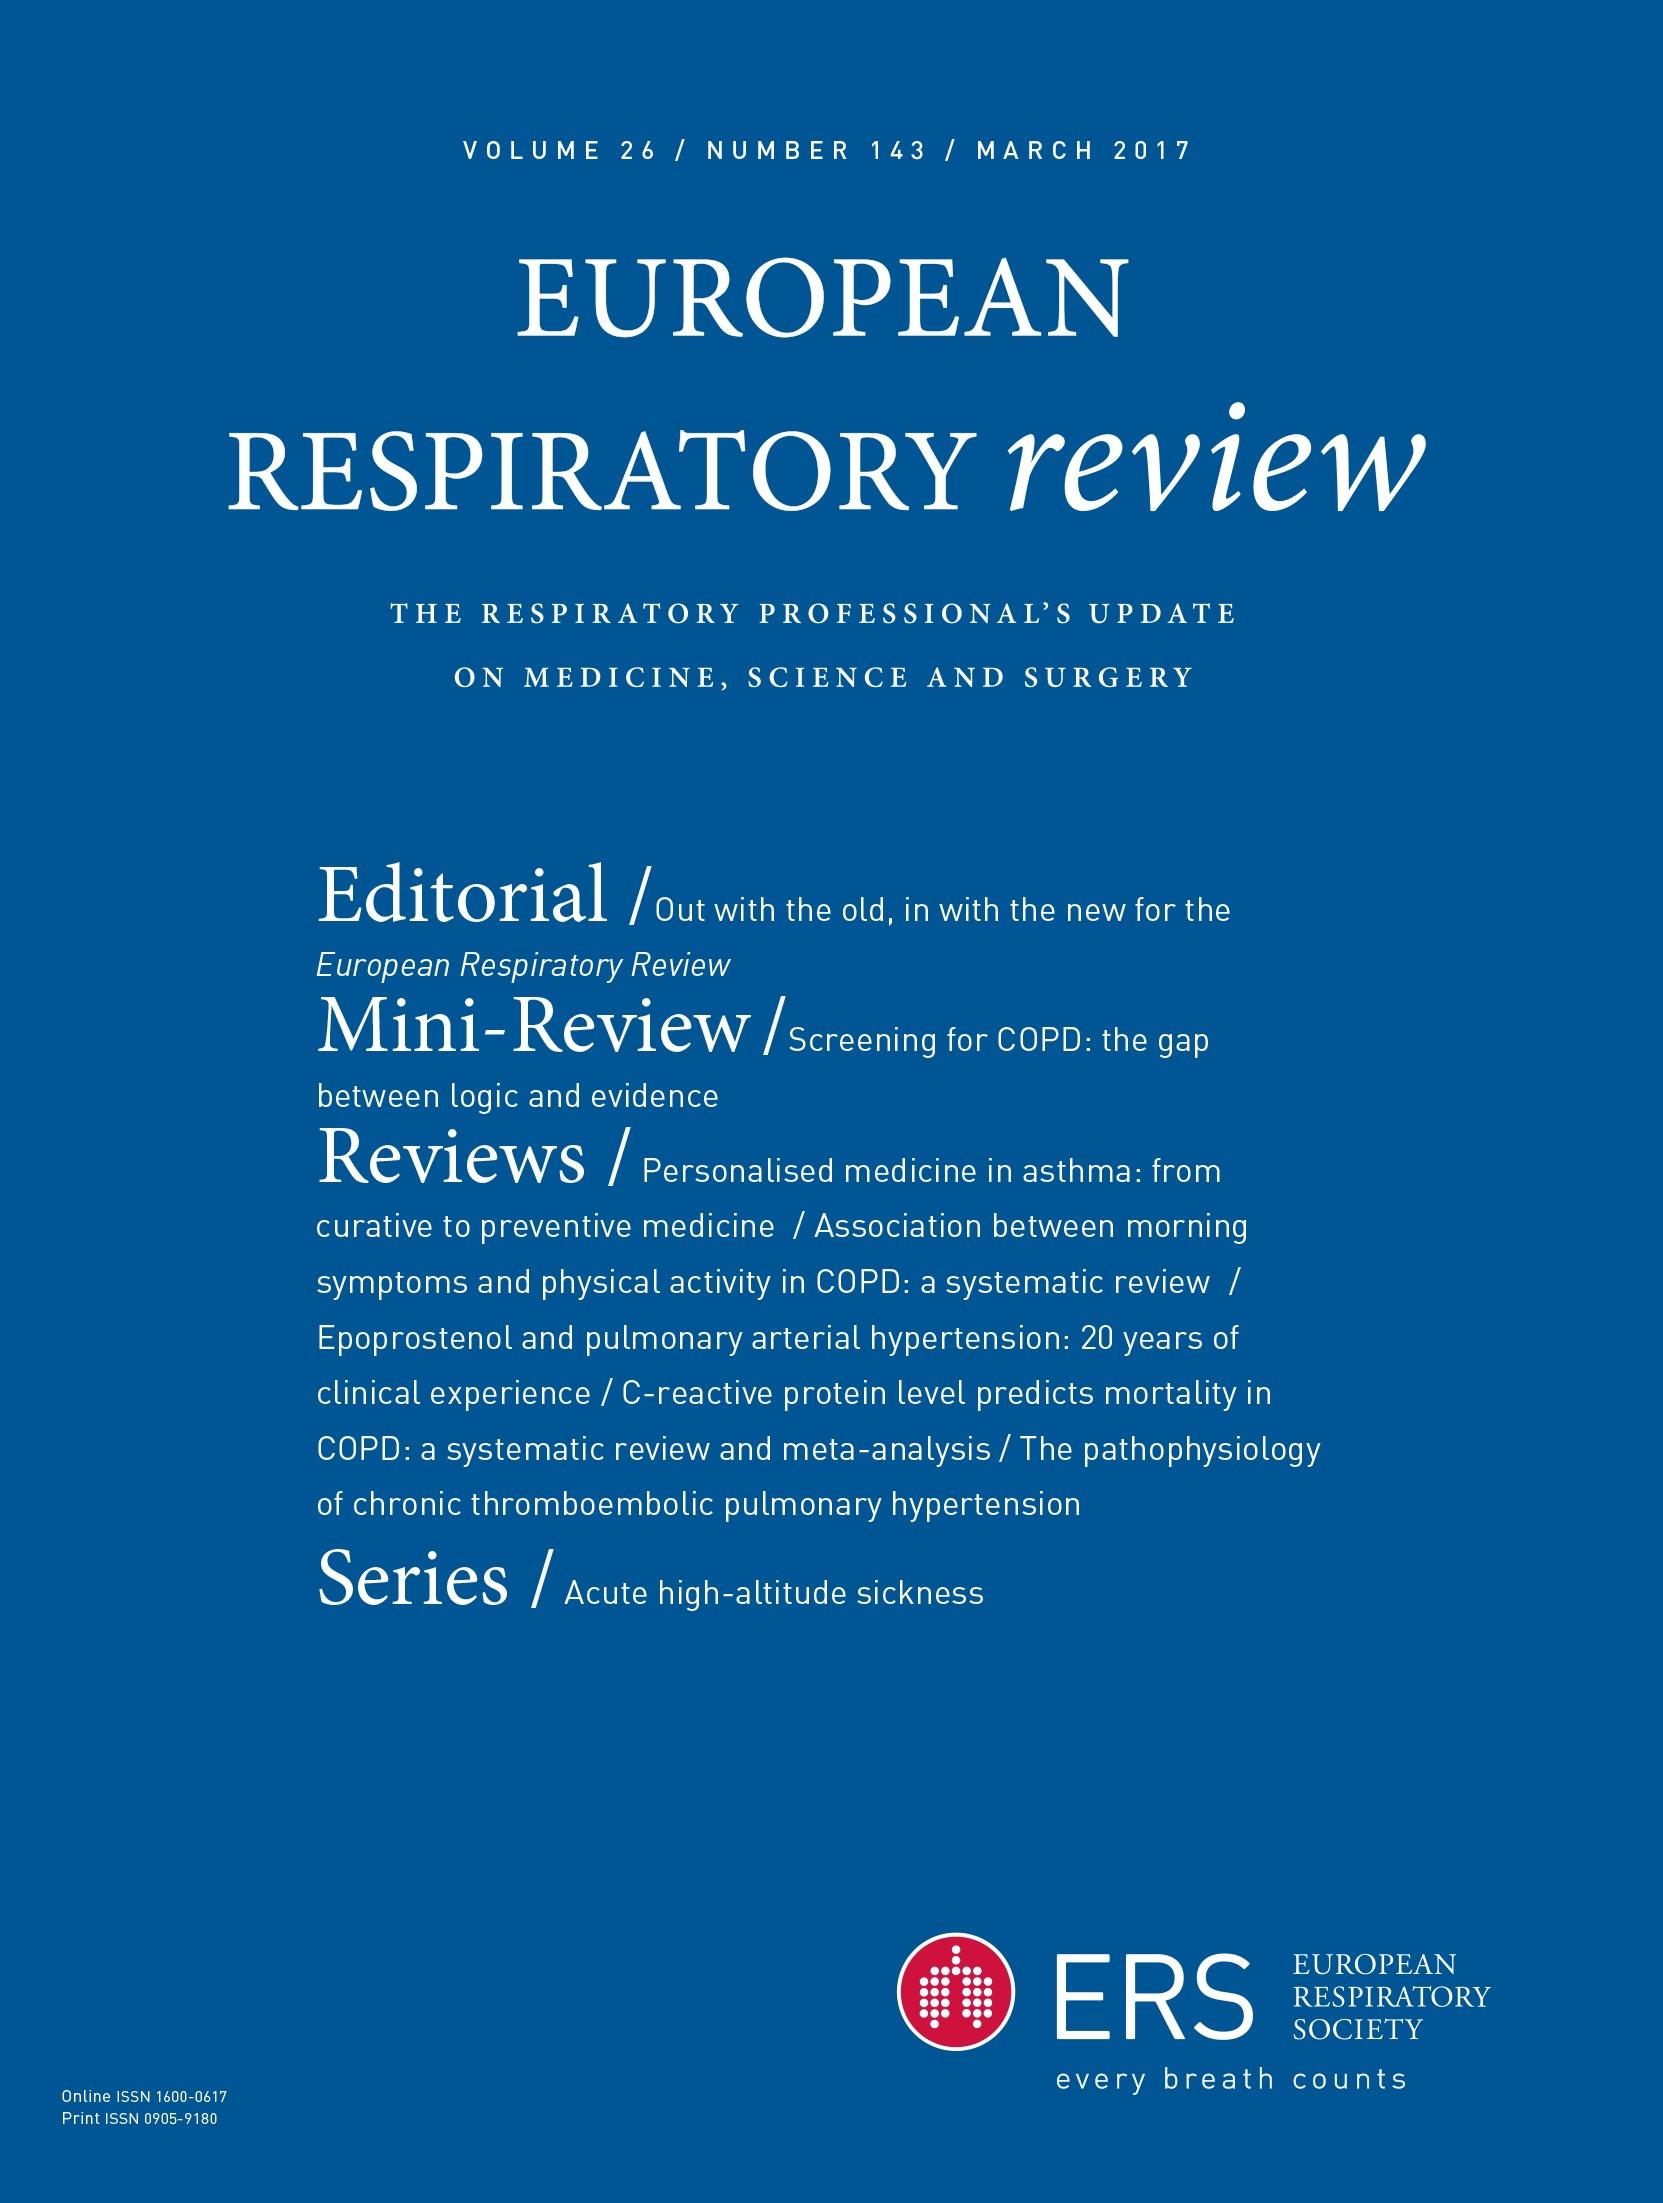 Acute high-altitude sickness | European Respiratory Society